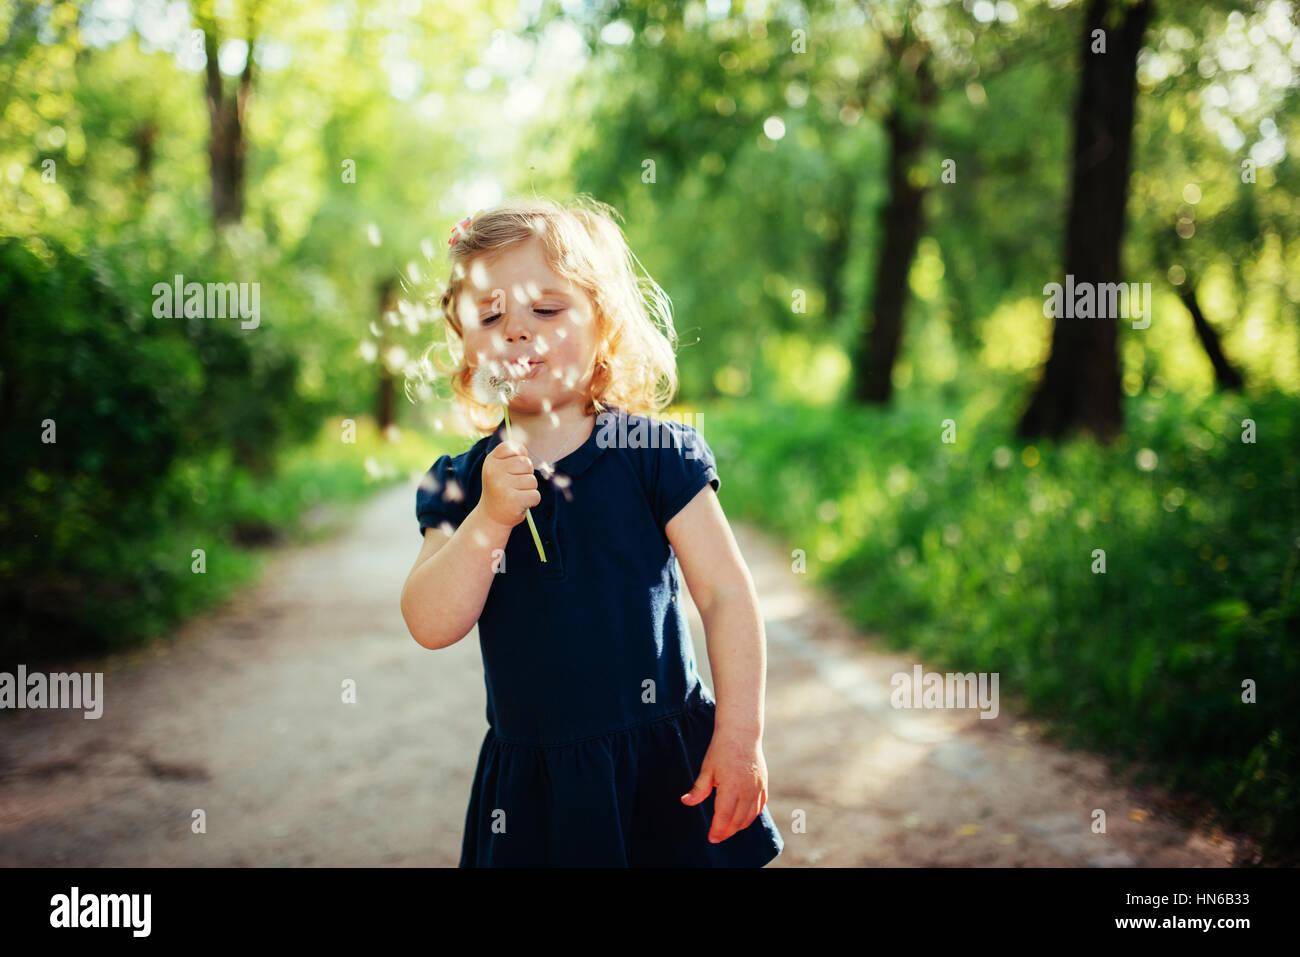 child with dandelion - Stock Image